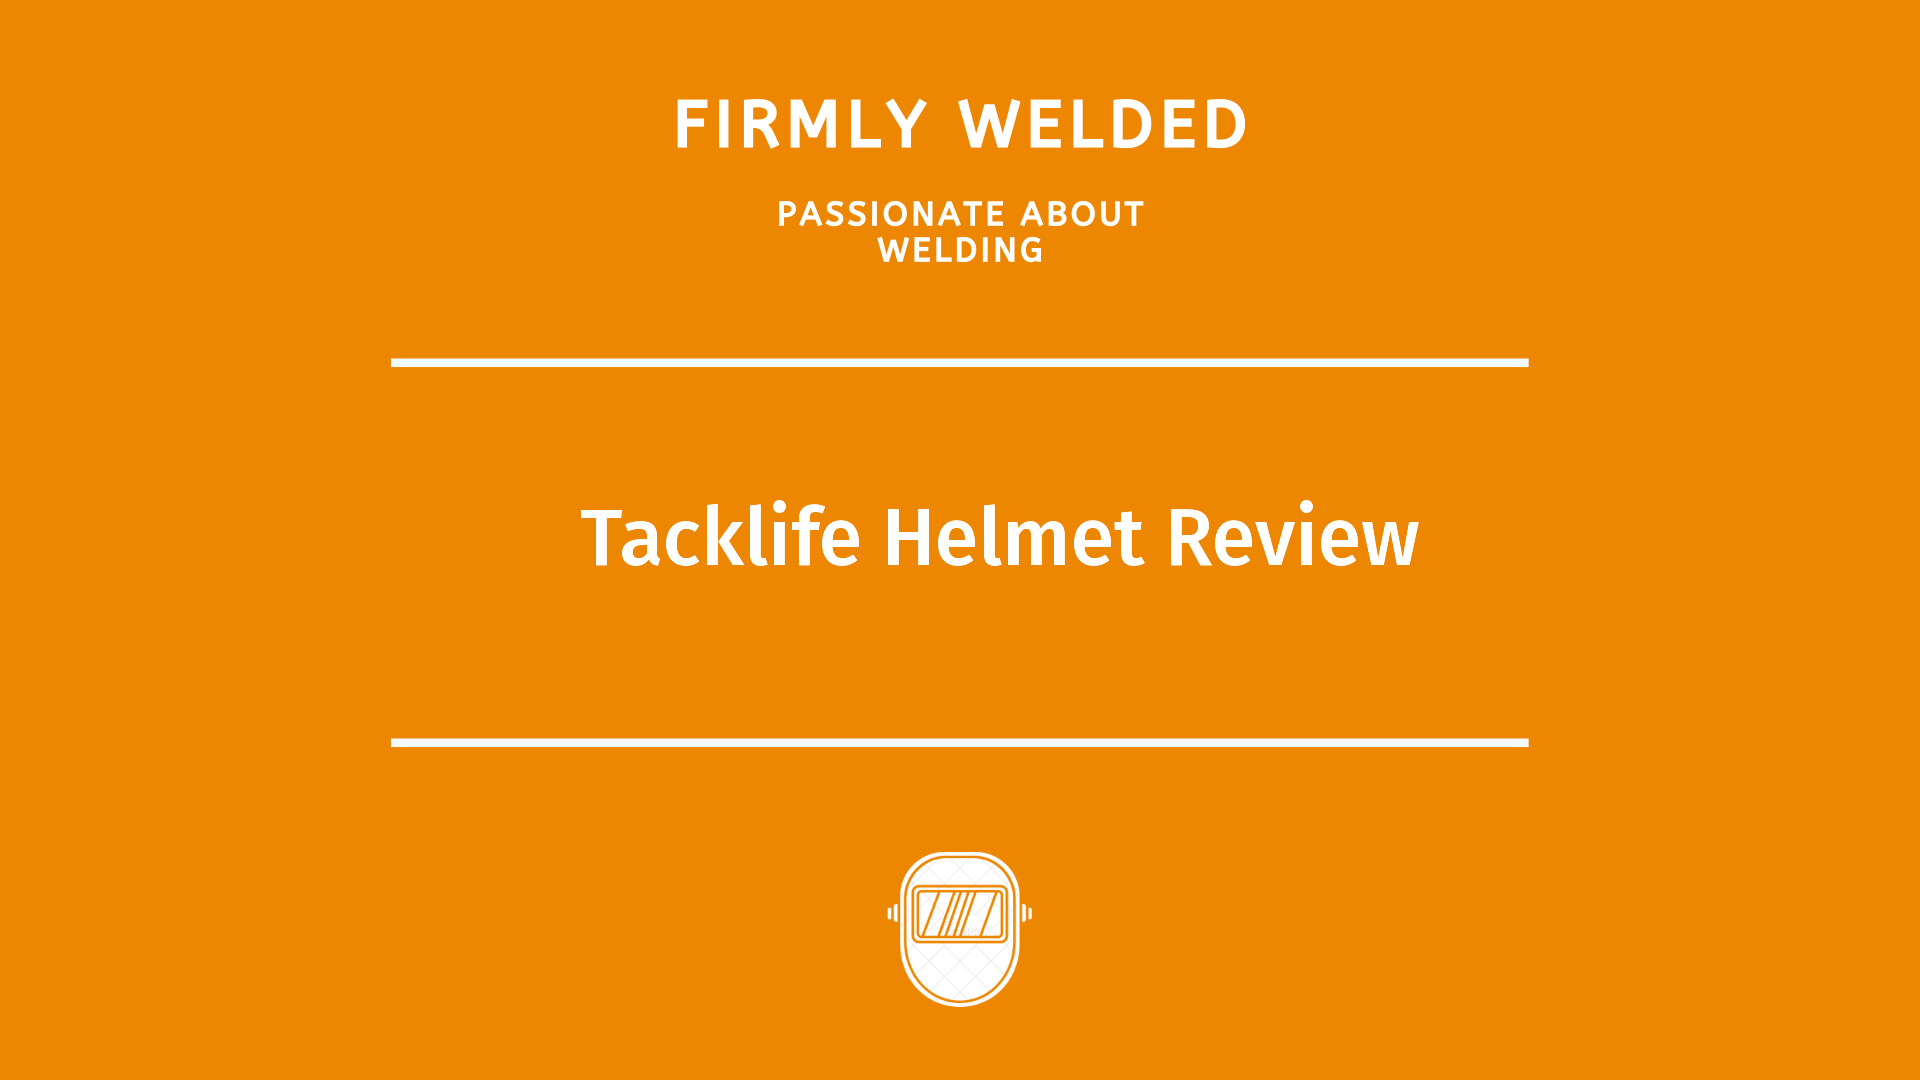 Tacklife Helmet Review